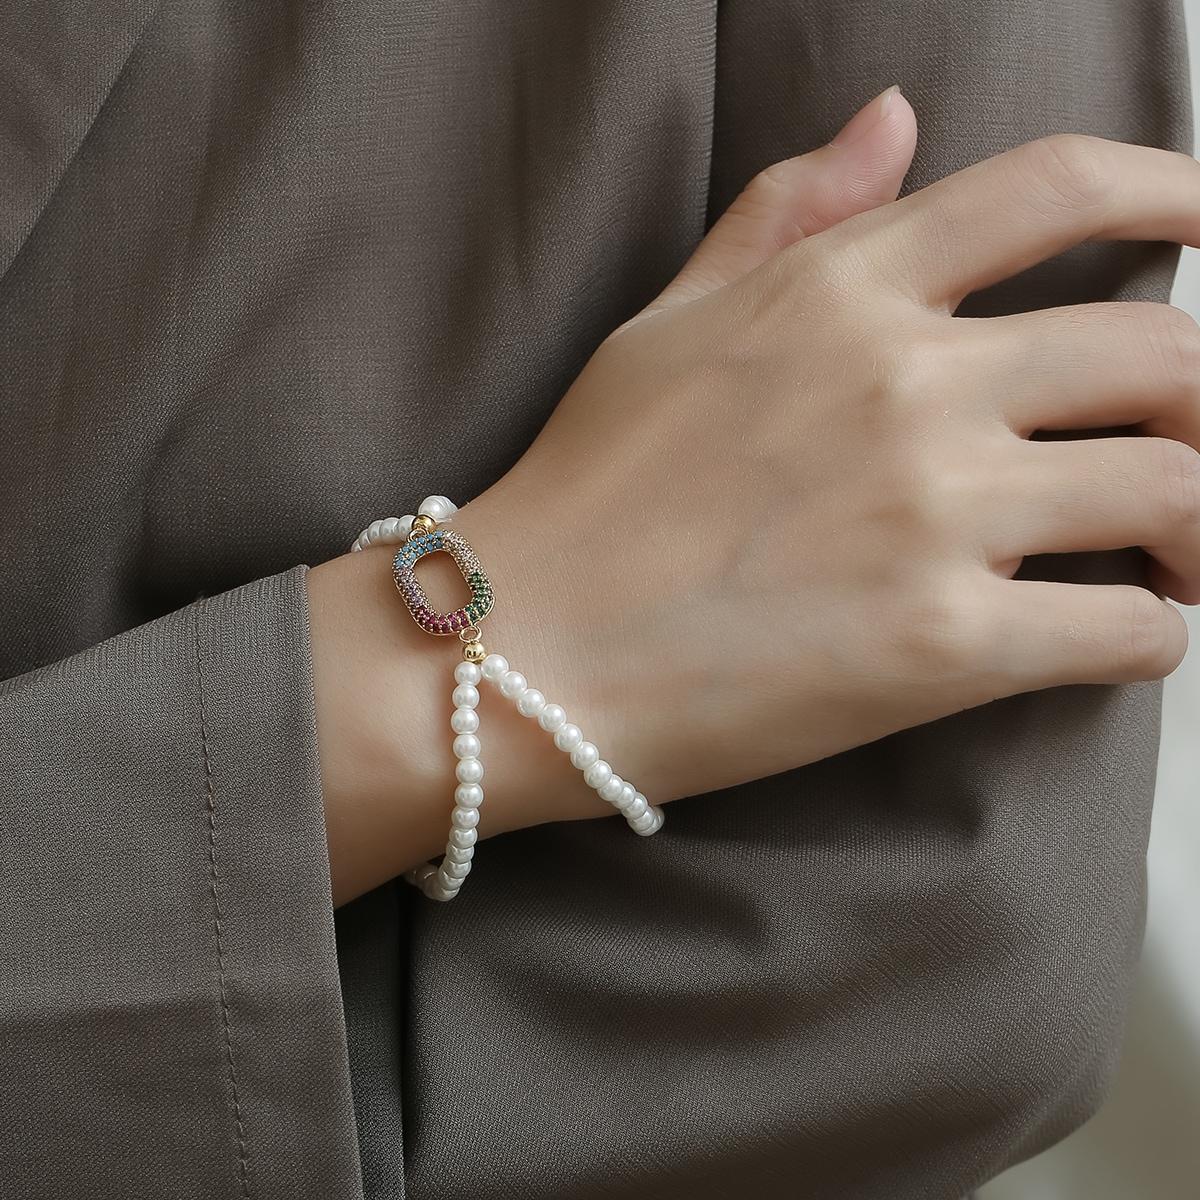 Zircon Decor Faux Pearl Beaded Bracelet, SHEIN  - buy with discount